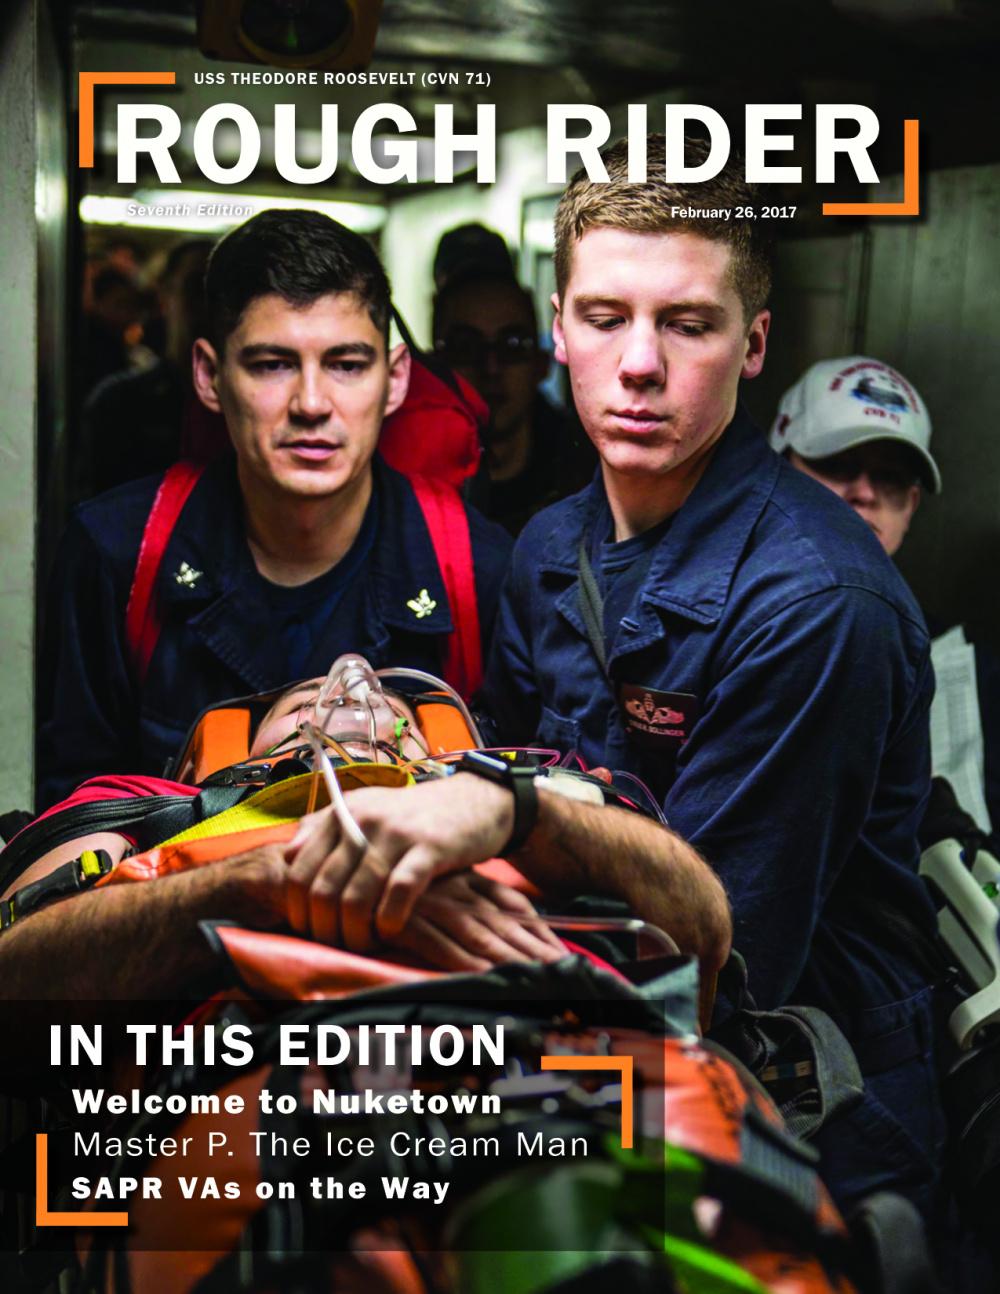 Rough Rider Magazine